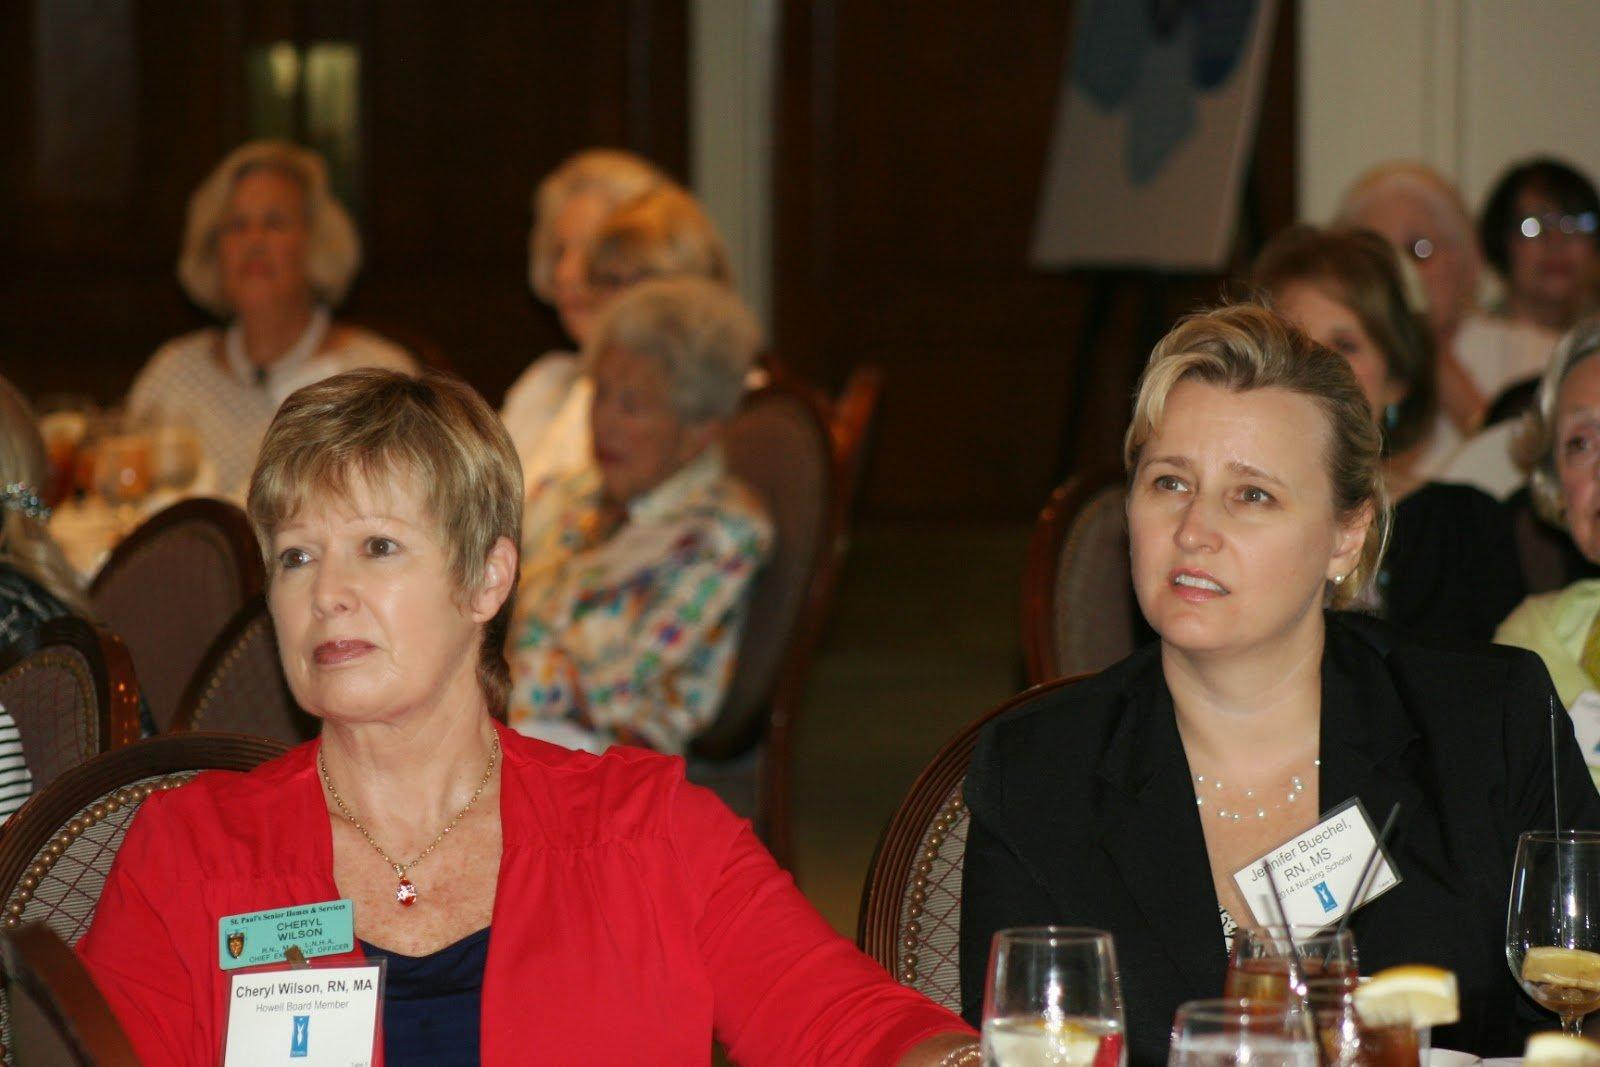 Cheryl Wilson and Jennifer Buechel Cheryl A Wilson Nursing Scholarship